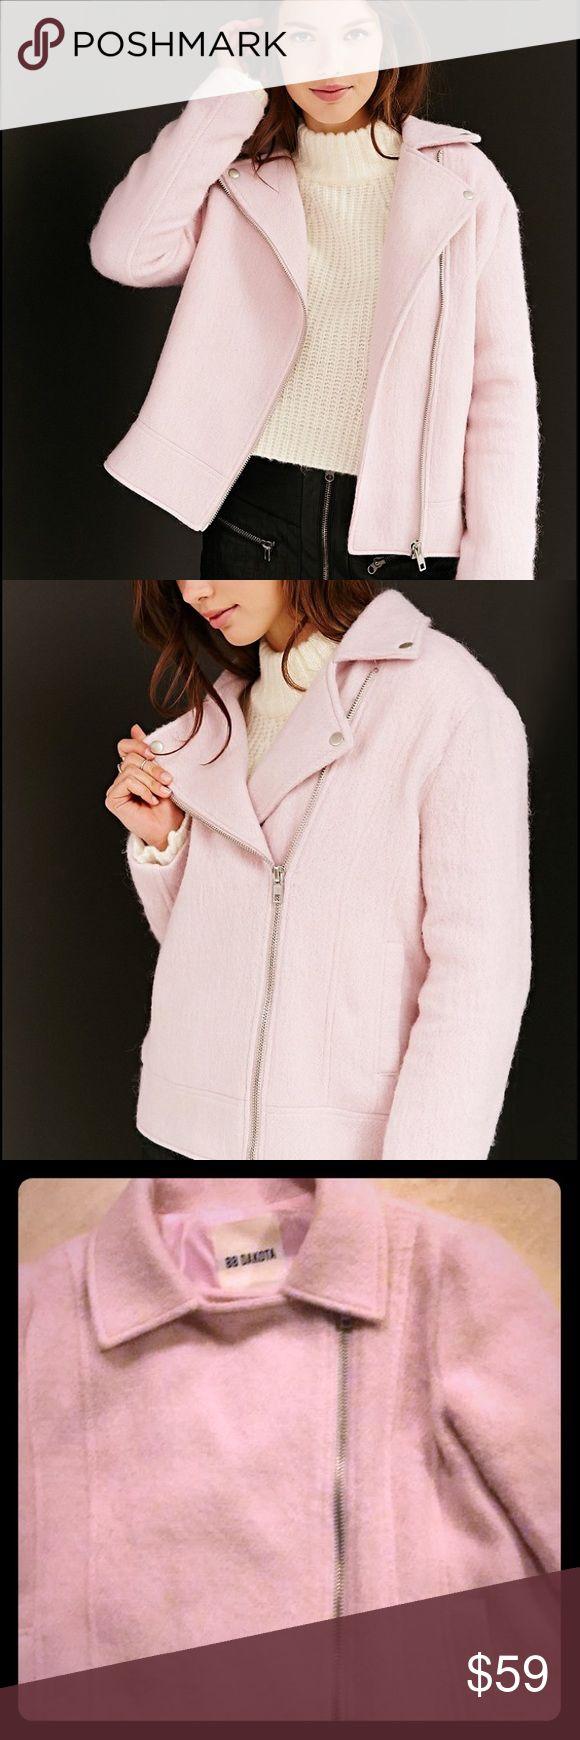 BB Dakota Pink Moto Jacket Pink Fuzzy Moto Jacket, XS. Front pockets and silver zipper. Excellent condition. BB Dakota Jackets & Coats